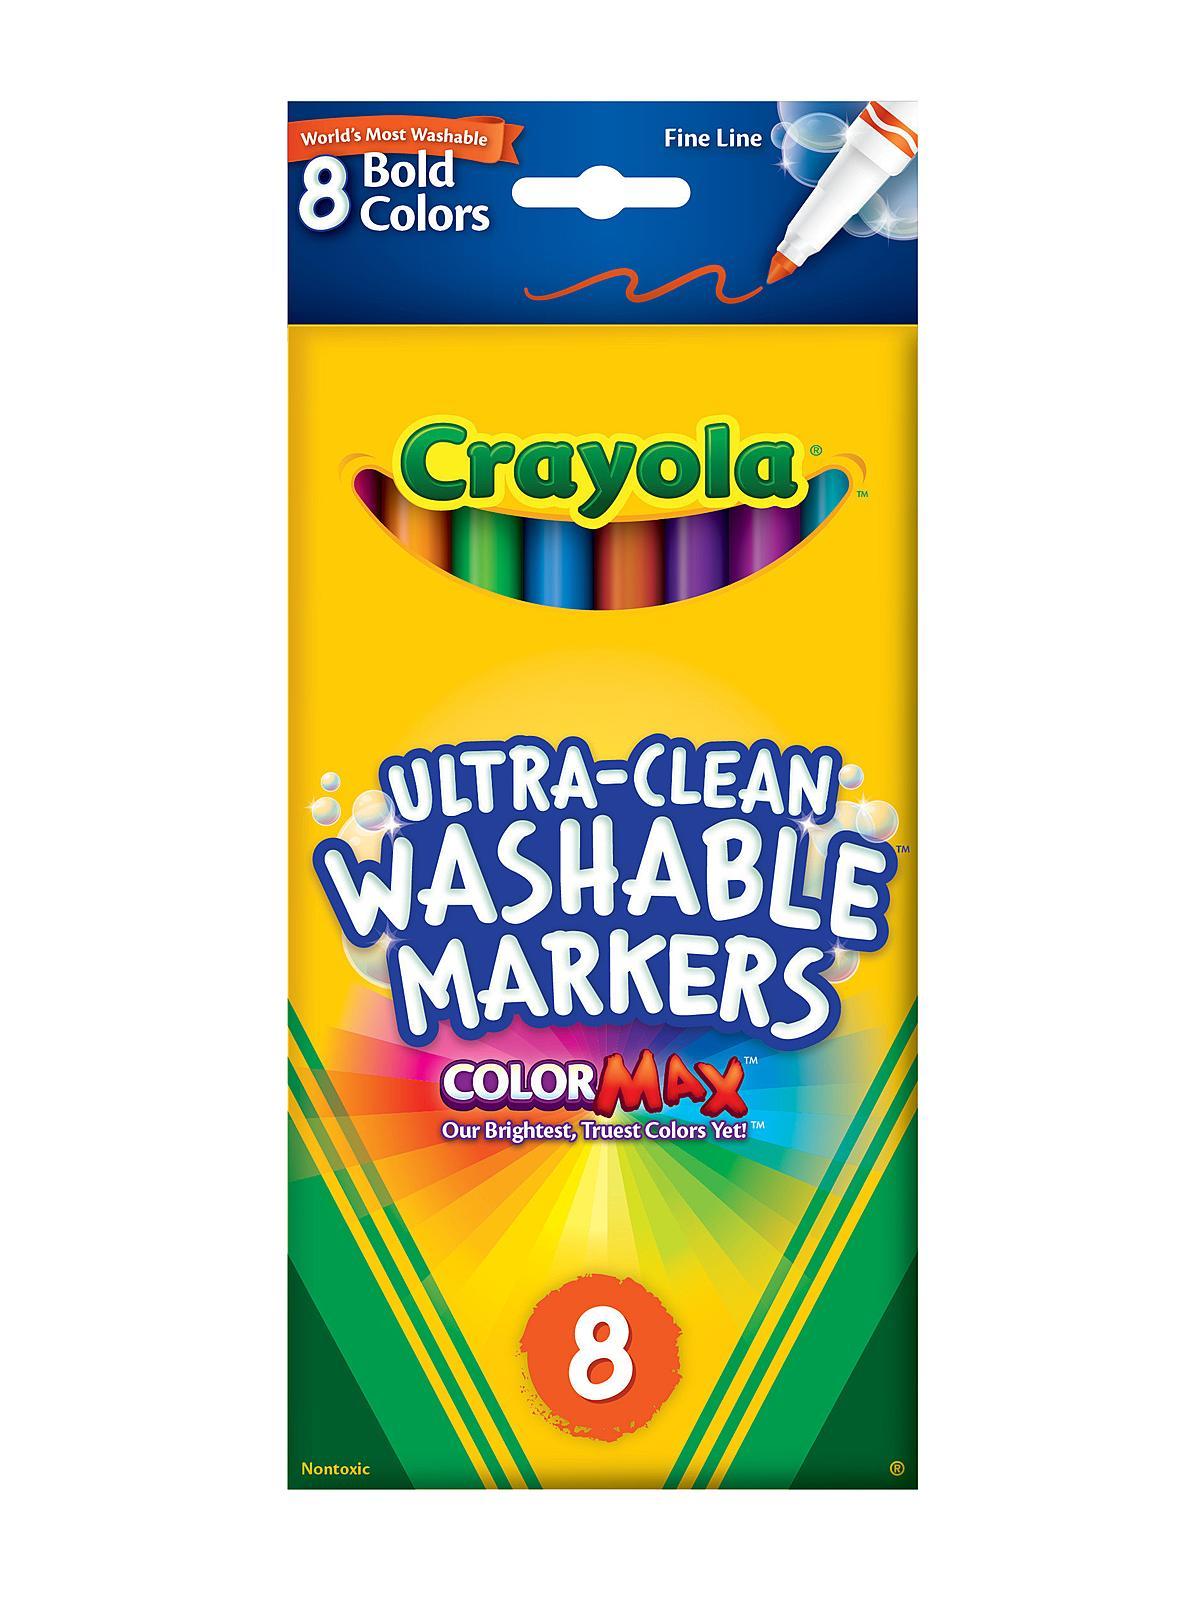 how to get crayola marker off mattress